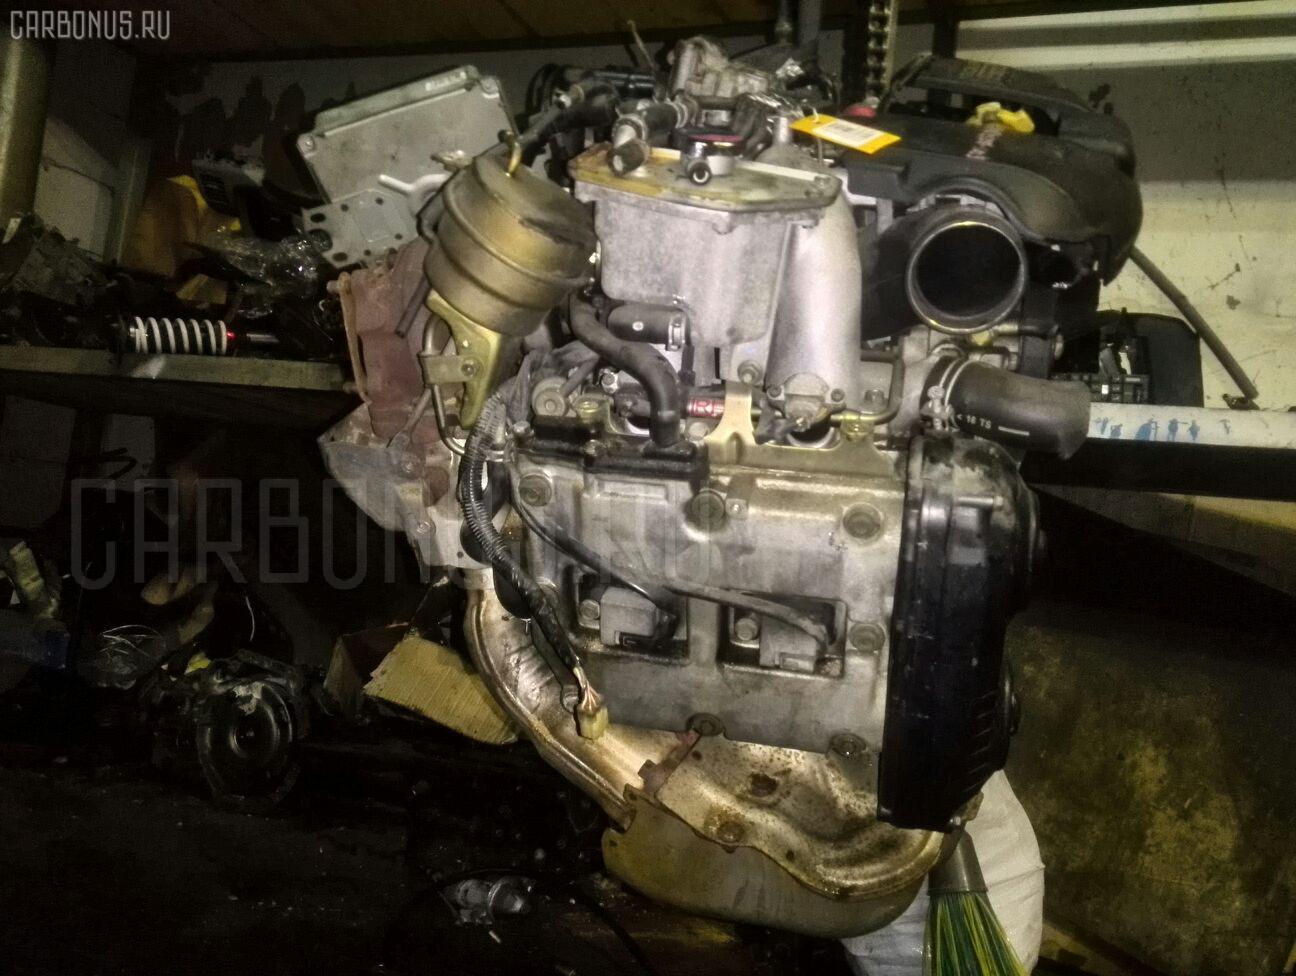 Двигатель SUBARU LEGACY WAGON BH5 EJ206DXCBE Фото 4